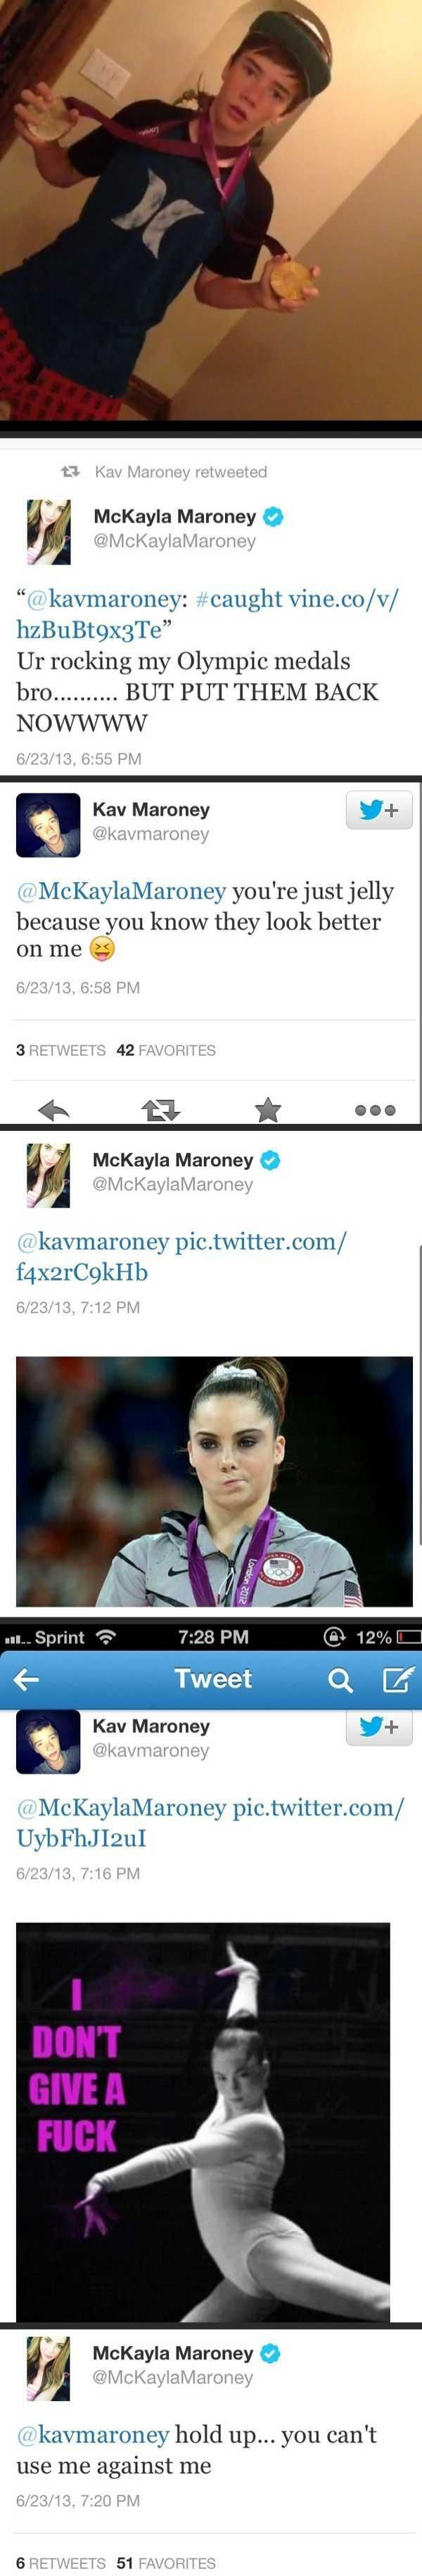 McKayla Maroney vs Her Brother (6 pics)